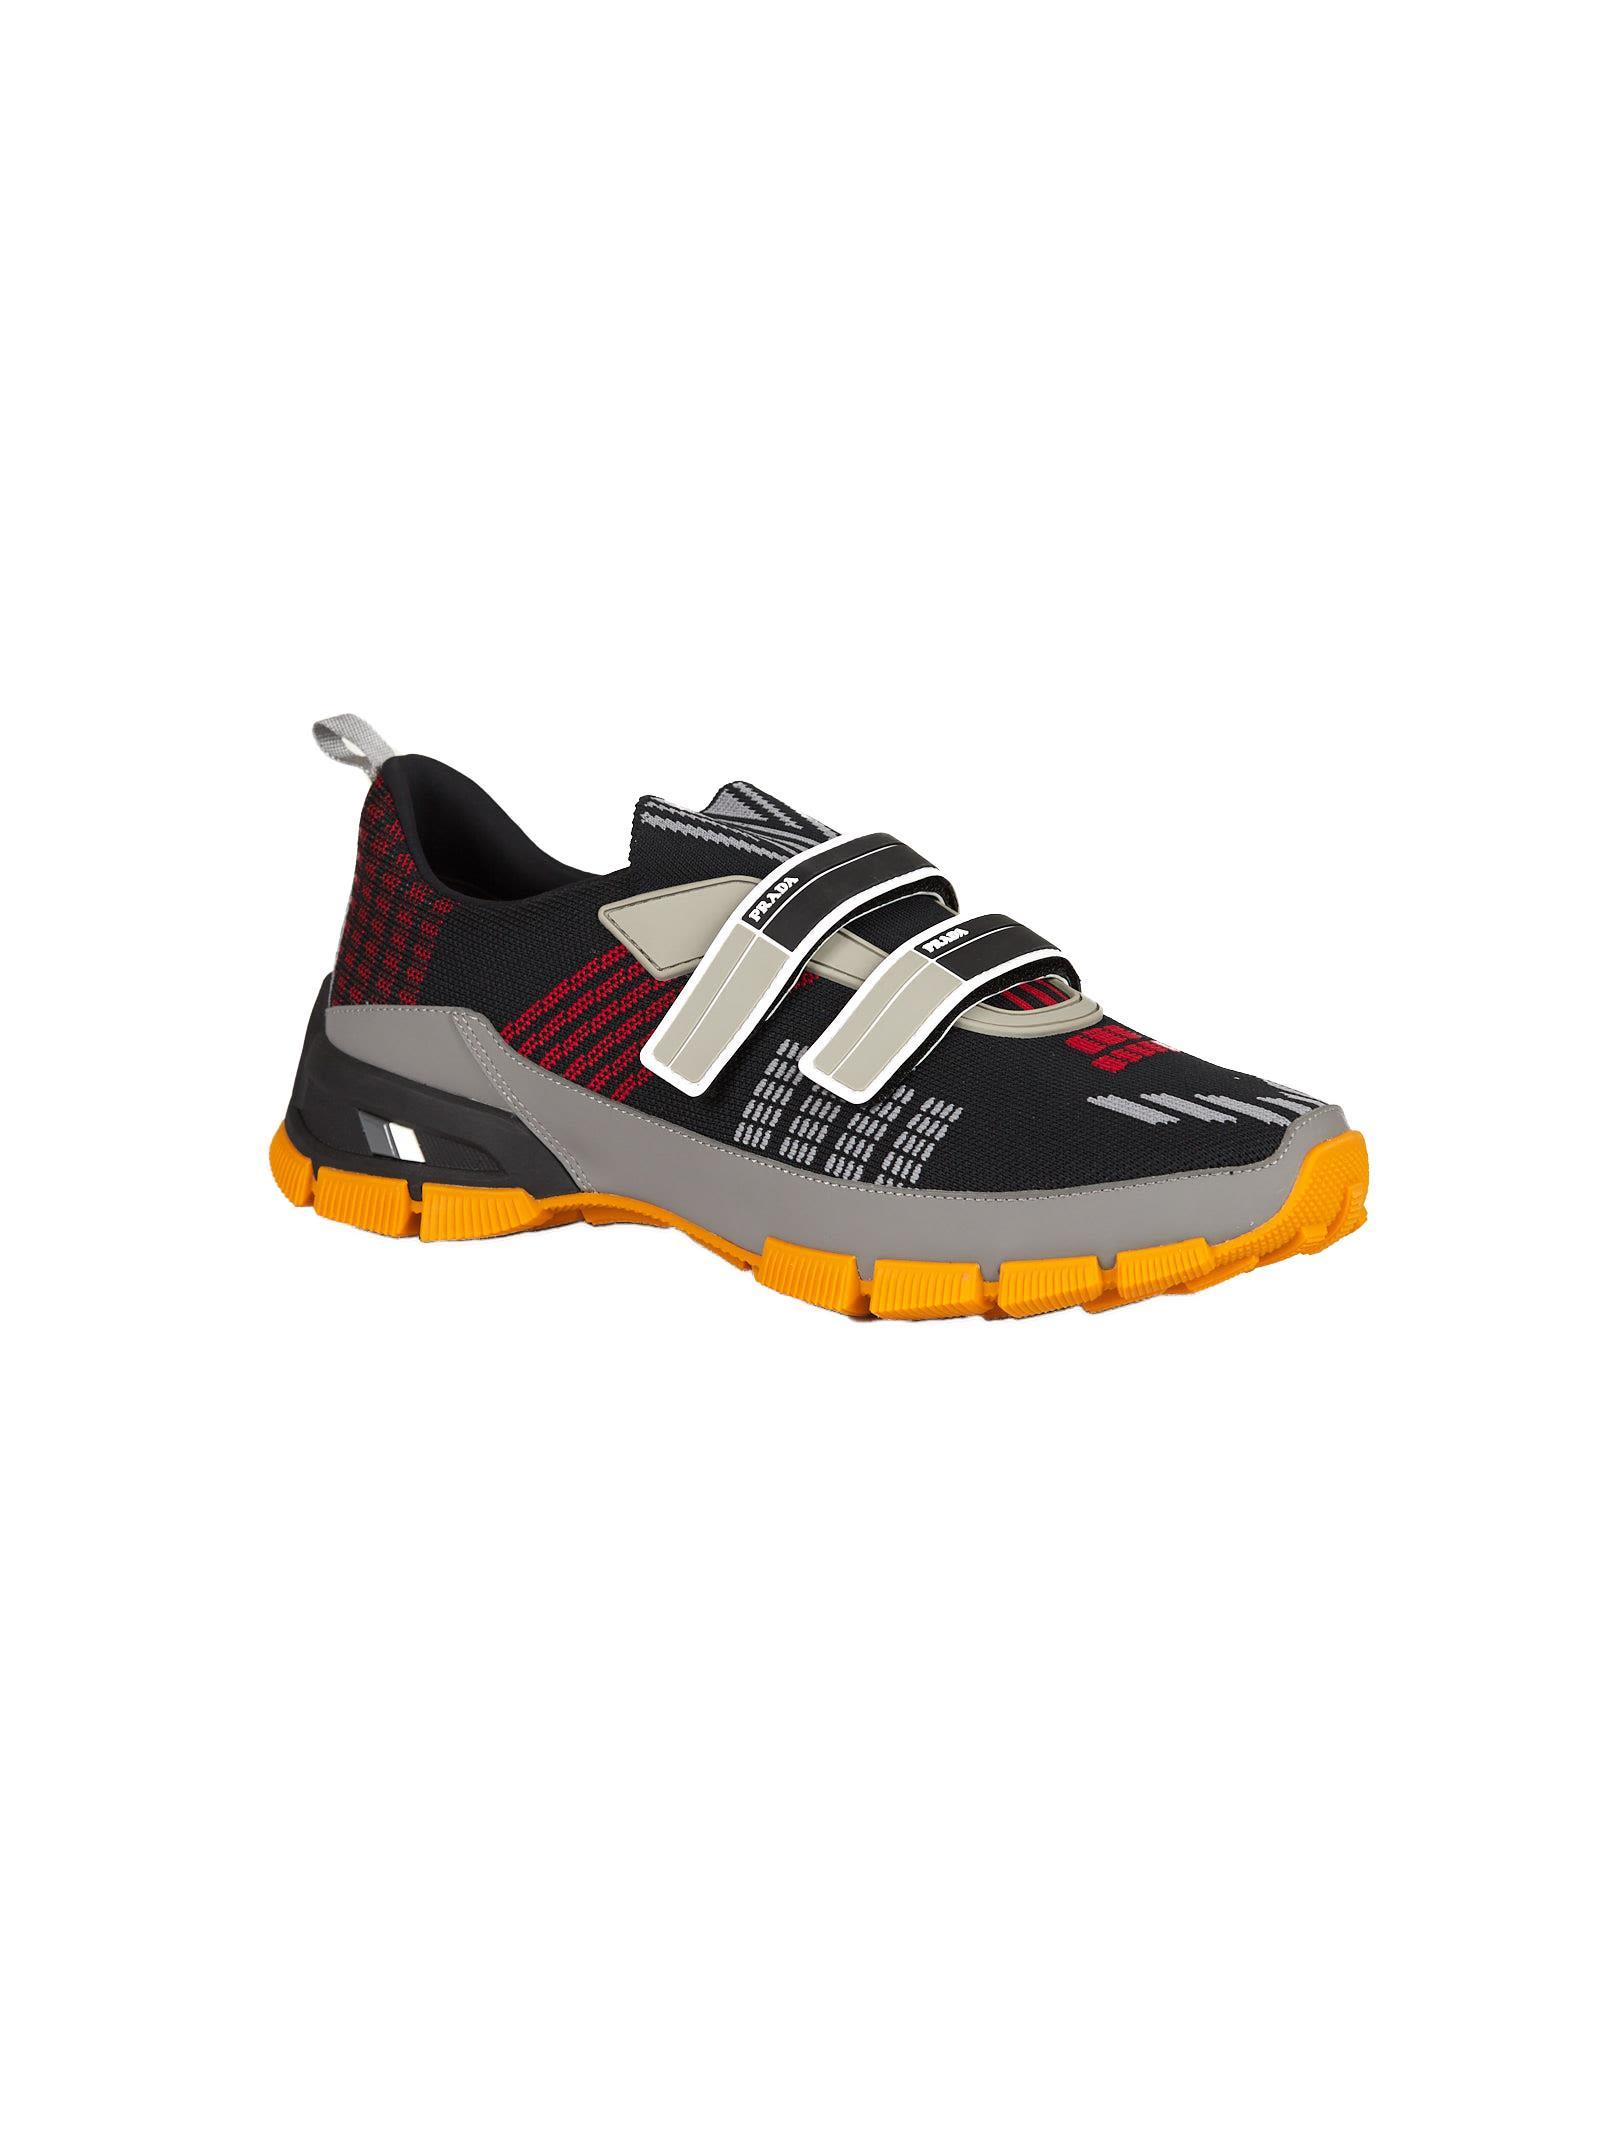 Prada touch-strap colour-block sneakers - Nero Aclaramiento Comercializable Encontrará Una Gran Línea eUfztHUVjF